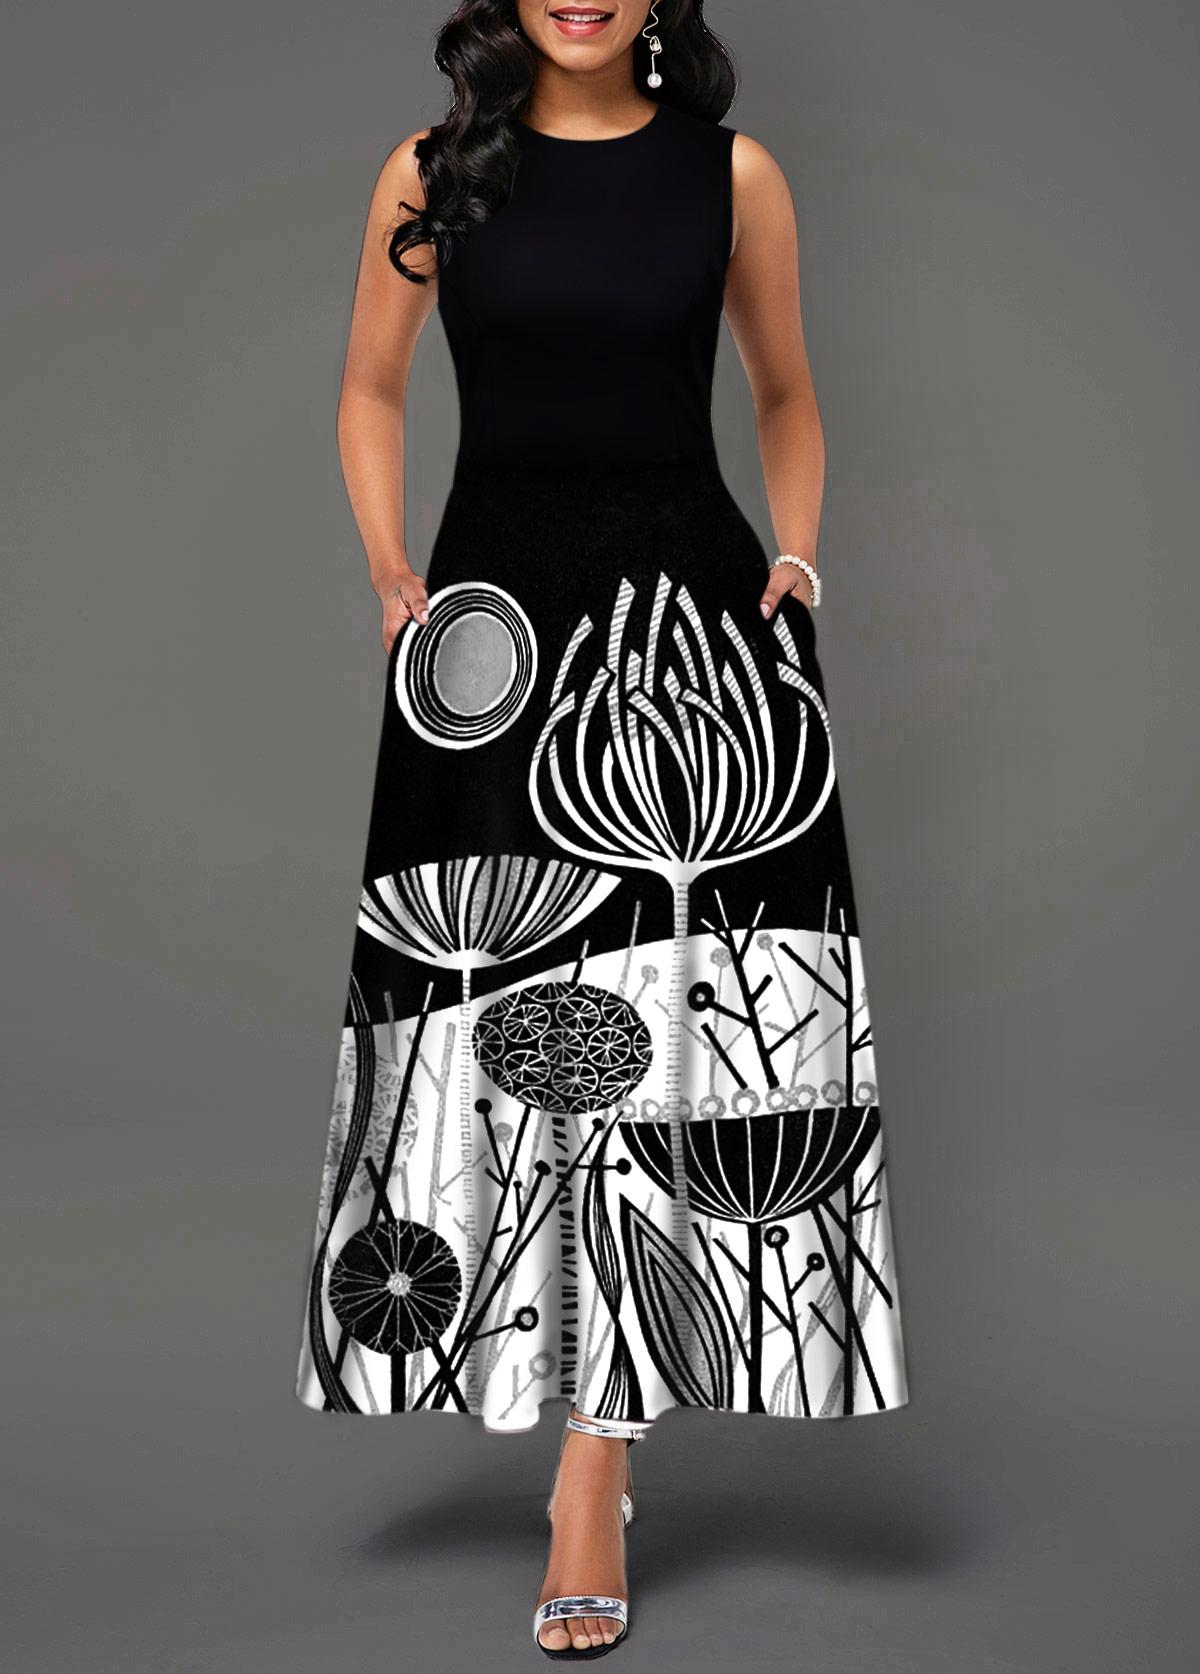 Round Neck Sleeveless Printed Black Dress